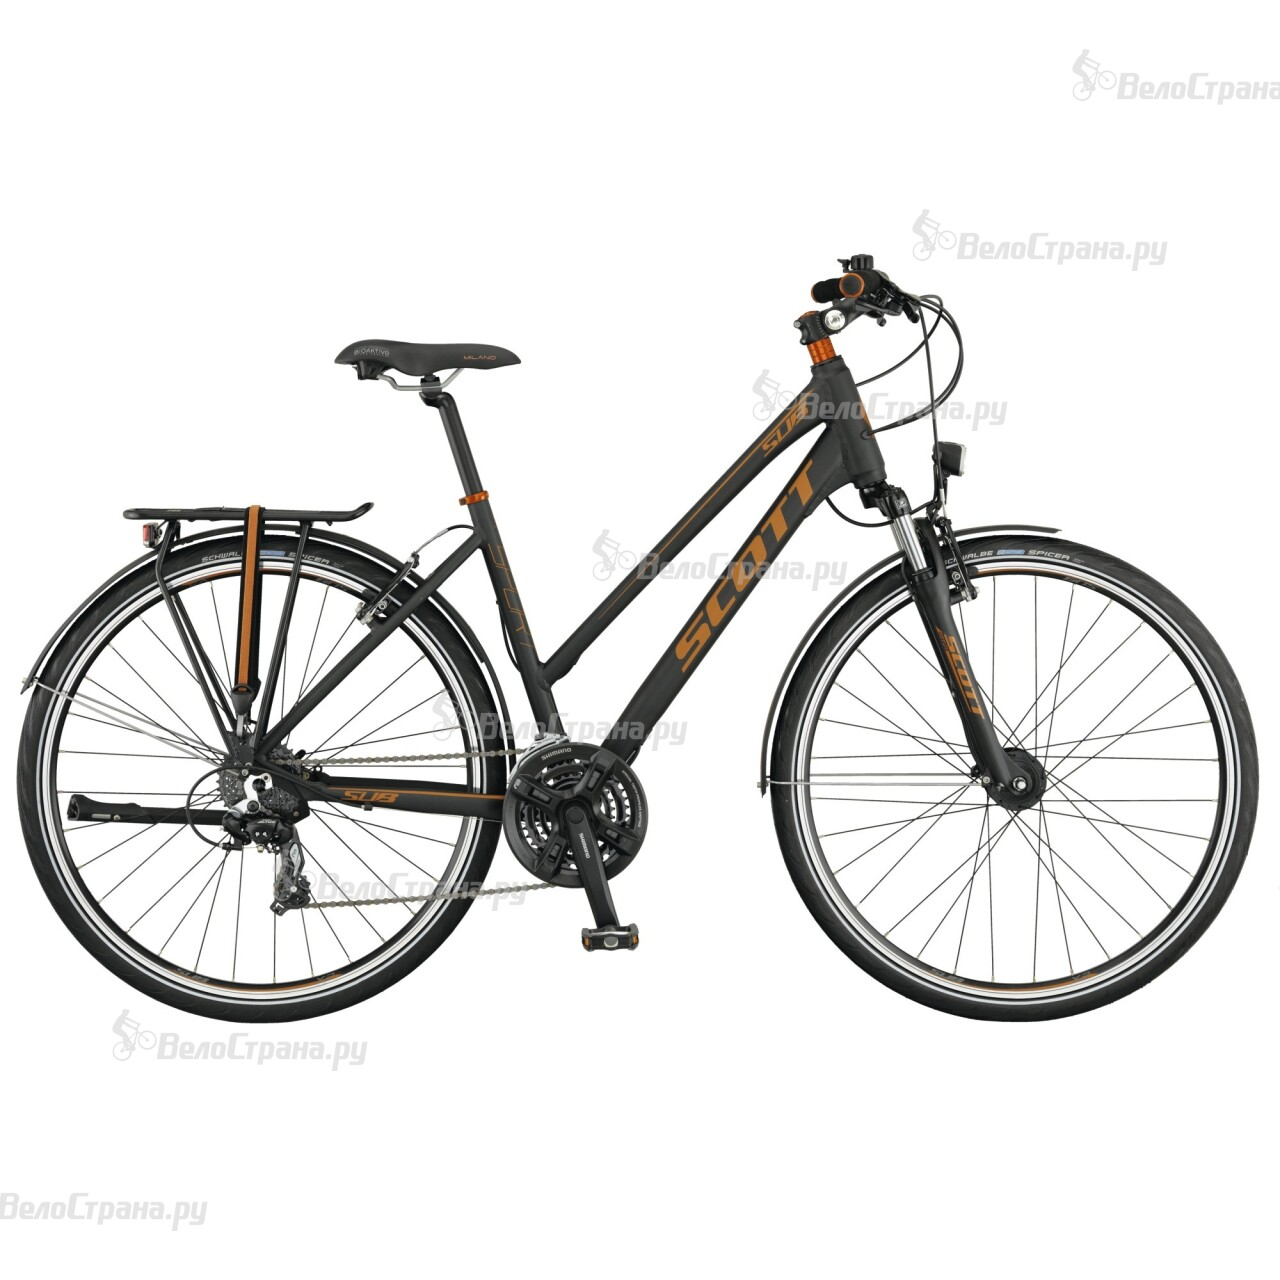 Велосипед Scott Sub Sport 30 Lady (2015)